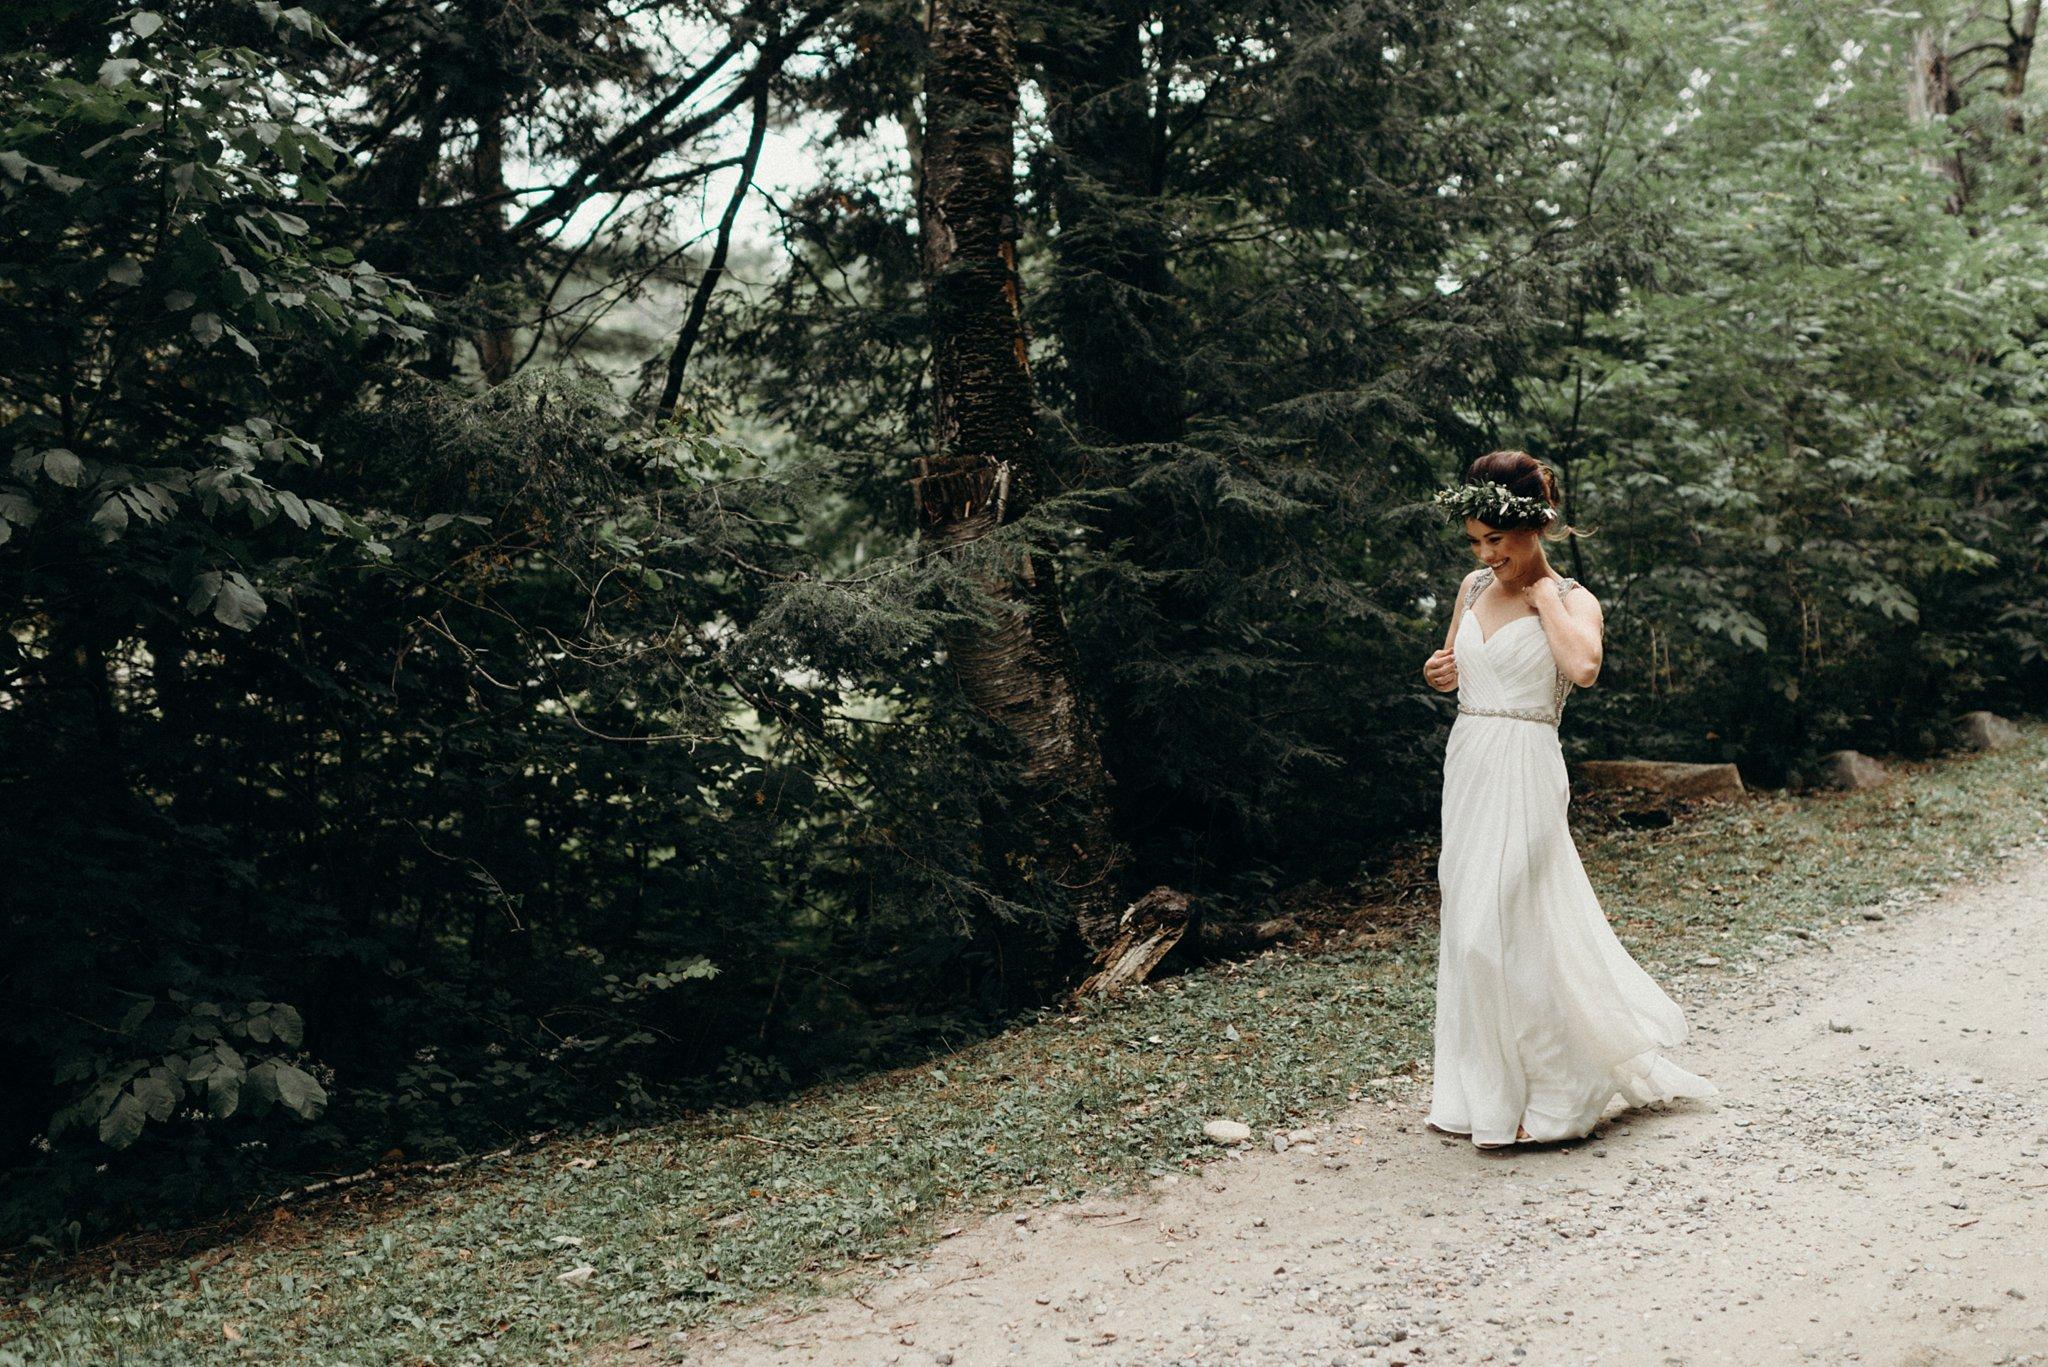 kaihla_tonai_intimate_wedding_elopement_photographer_6566.jpg